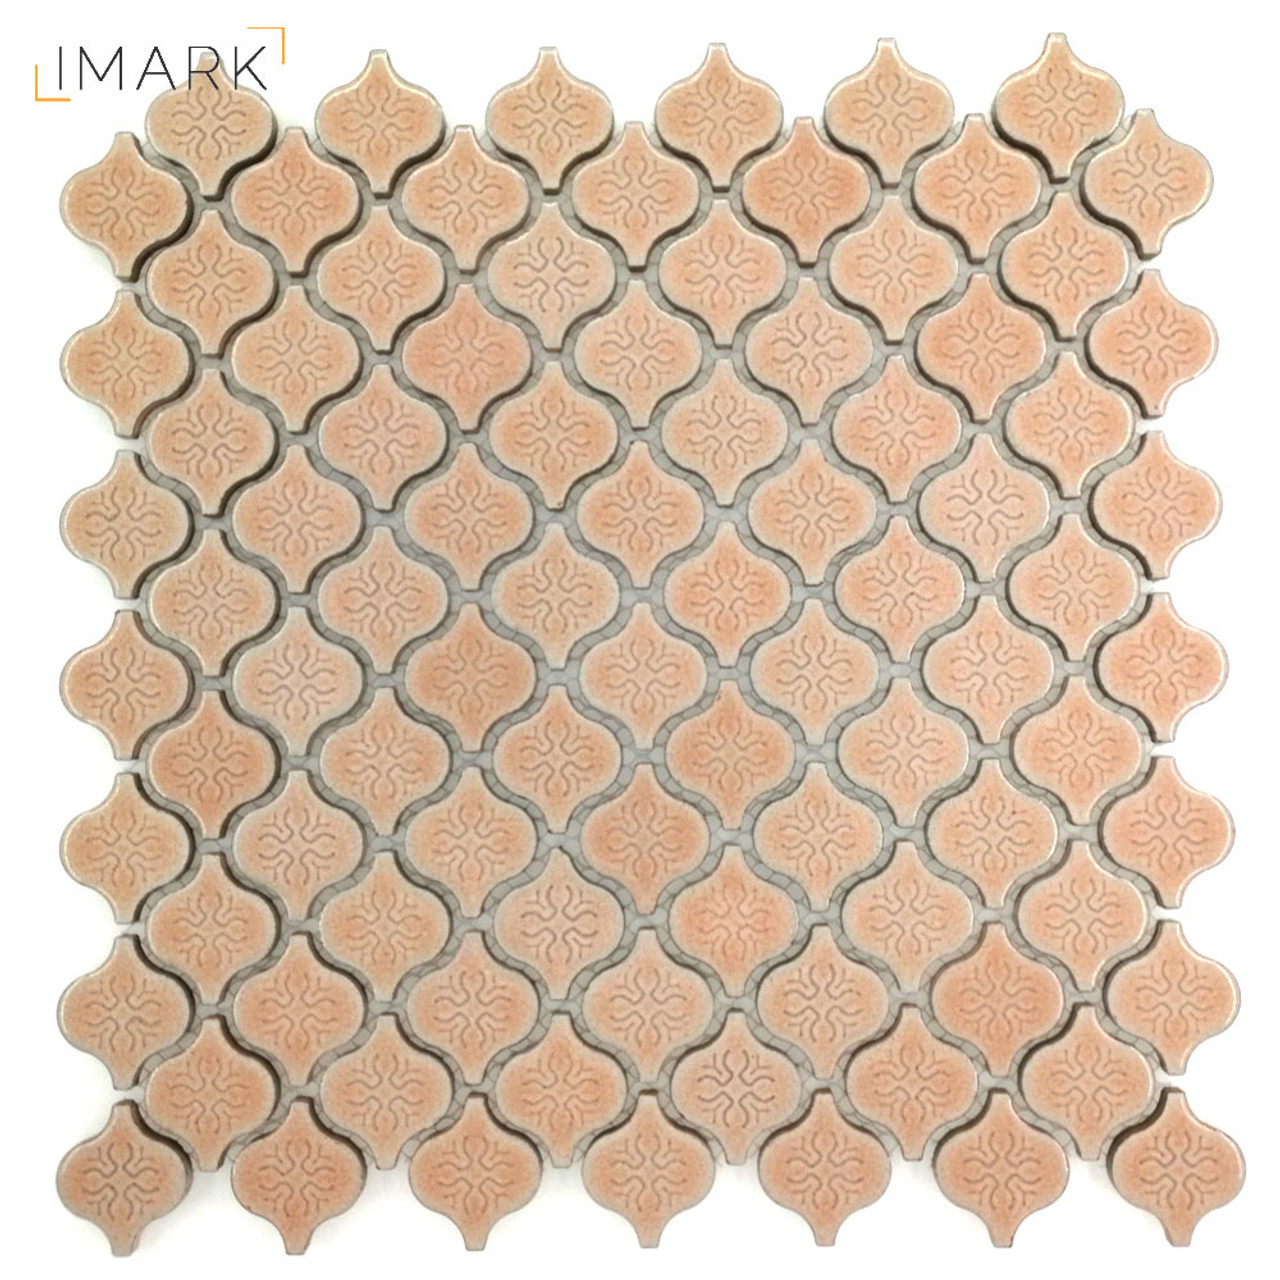 Lantern glazed ceramic tile mosaic mesh mounted for kitchen mini lantern glazed ceramic tile mosaic mesh mounted for kitchen backsplash cl353803 dailygadgetfo Gallery